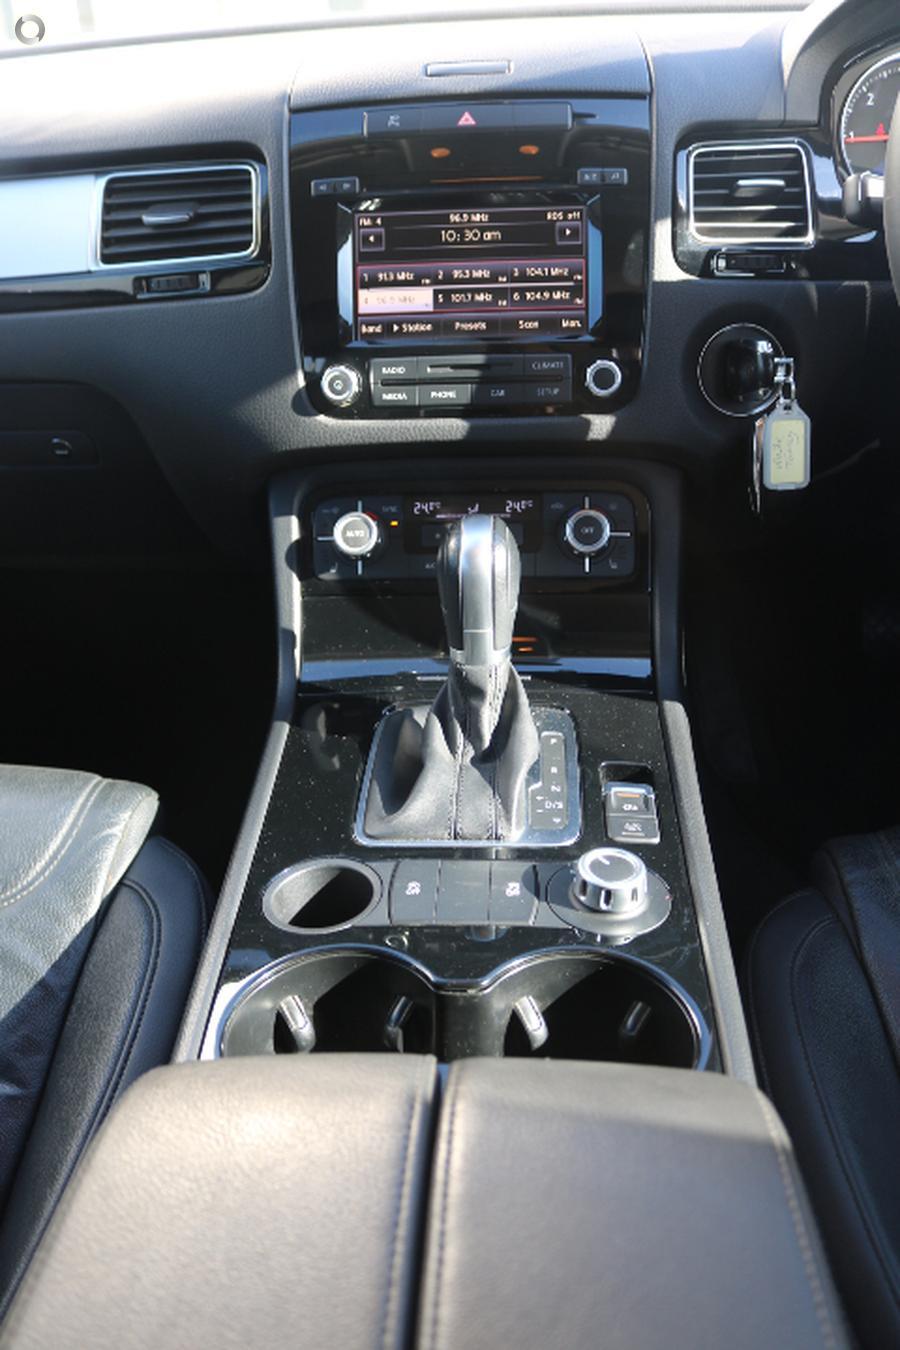 2014 Volkswagen Touareg 150TDI 7P